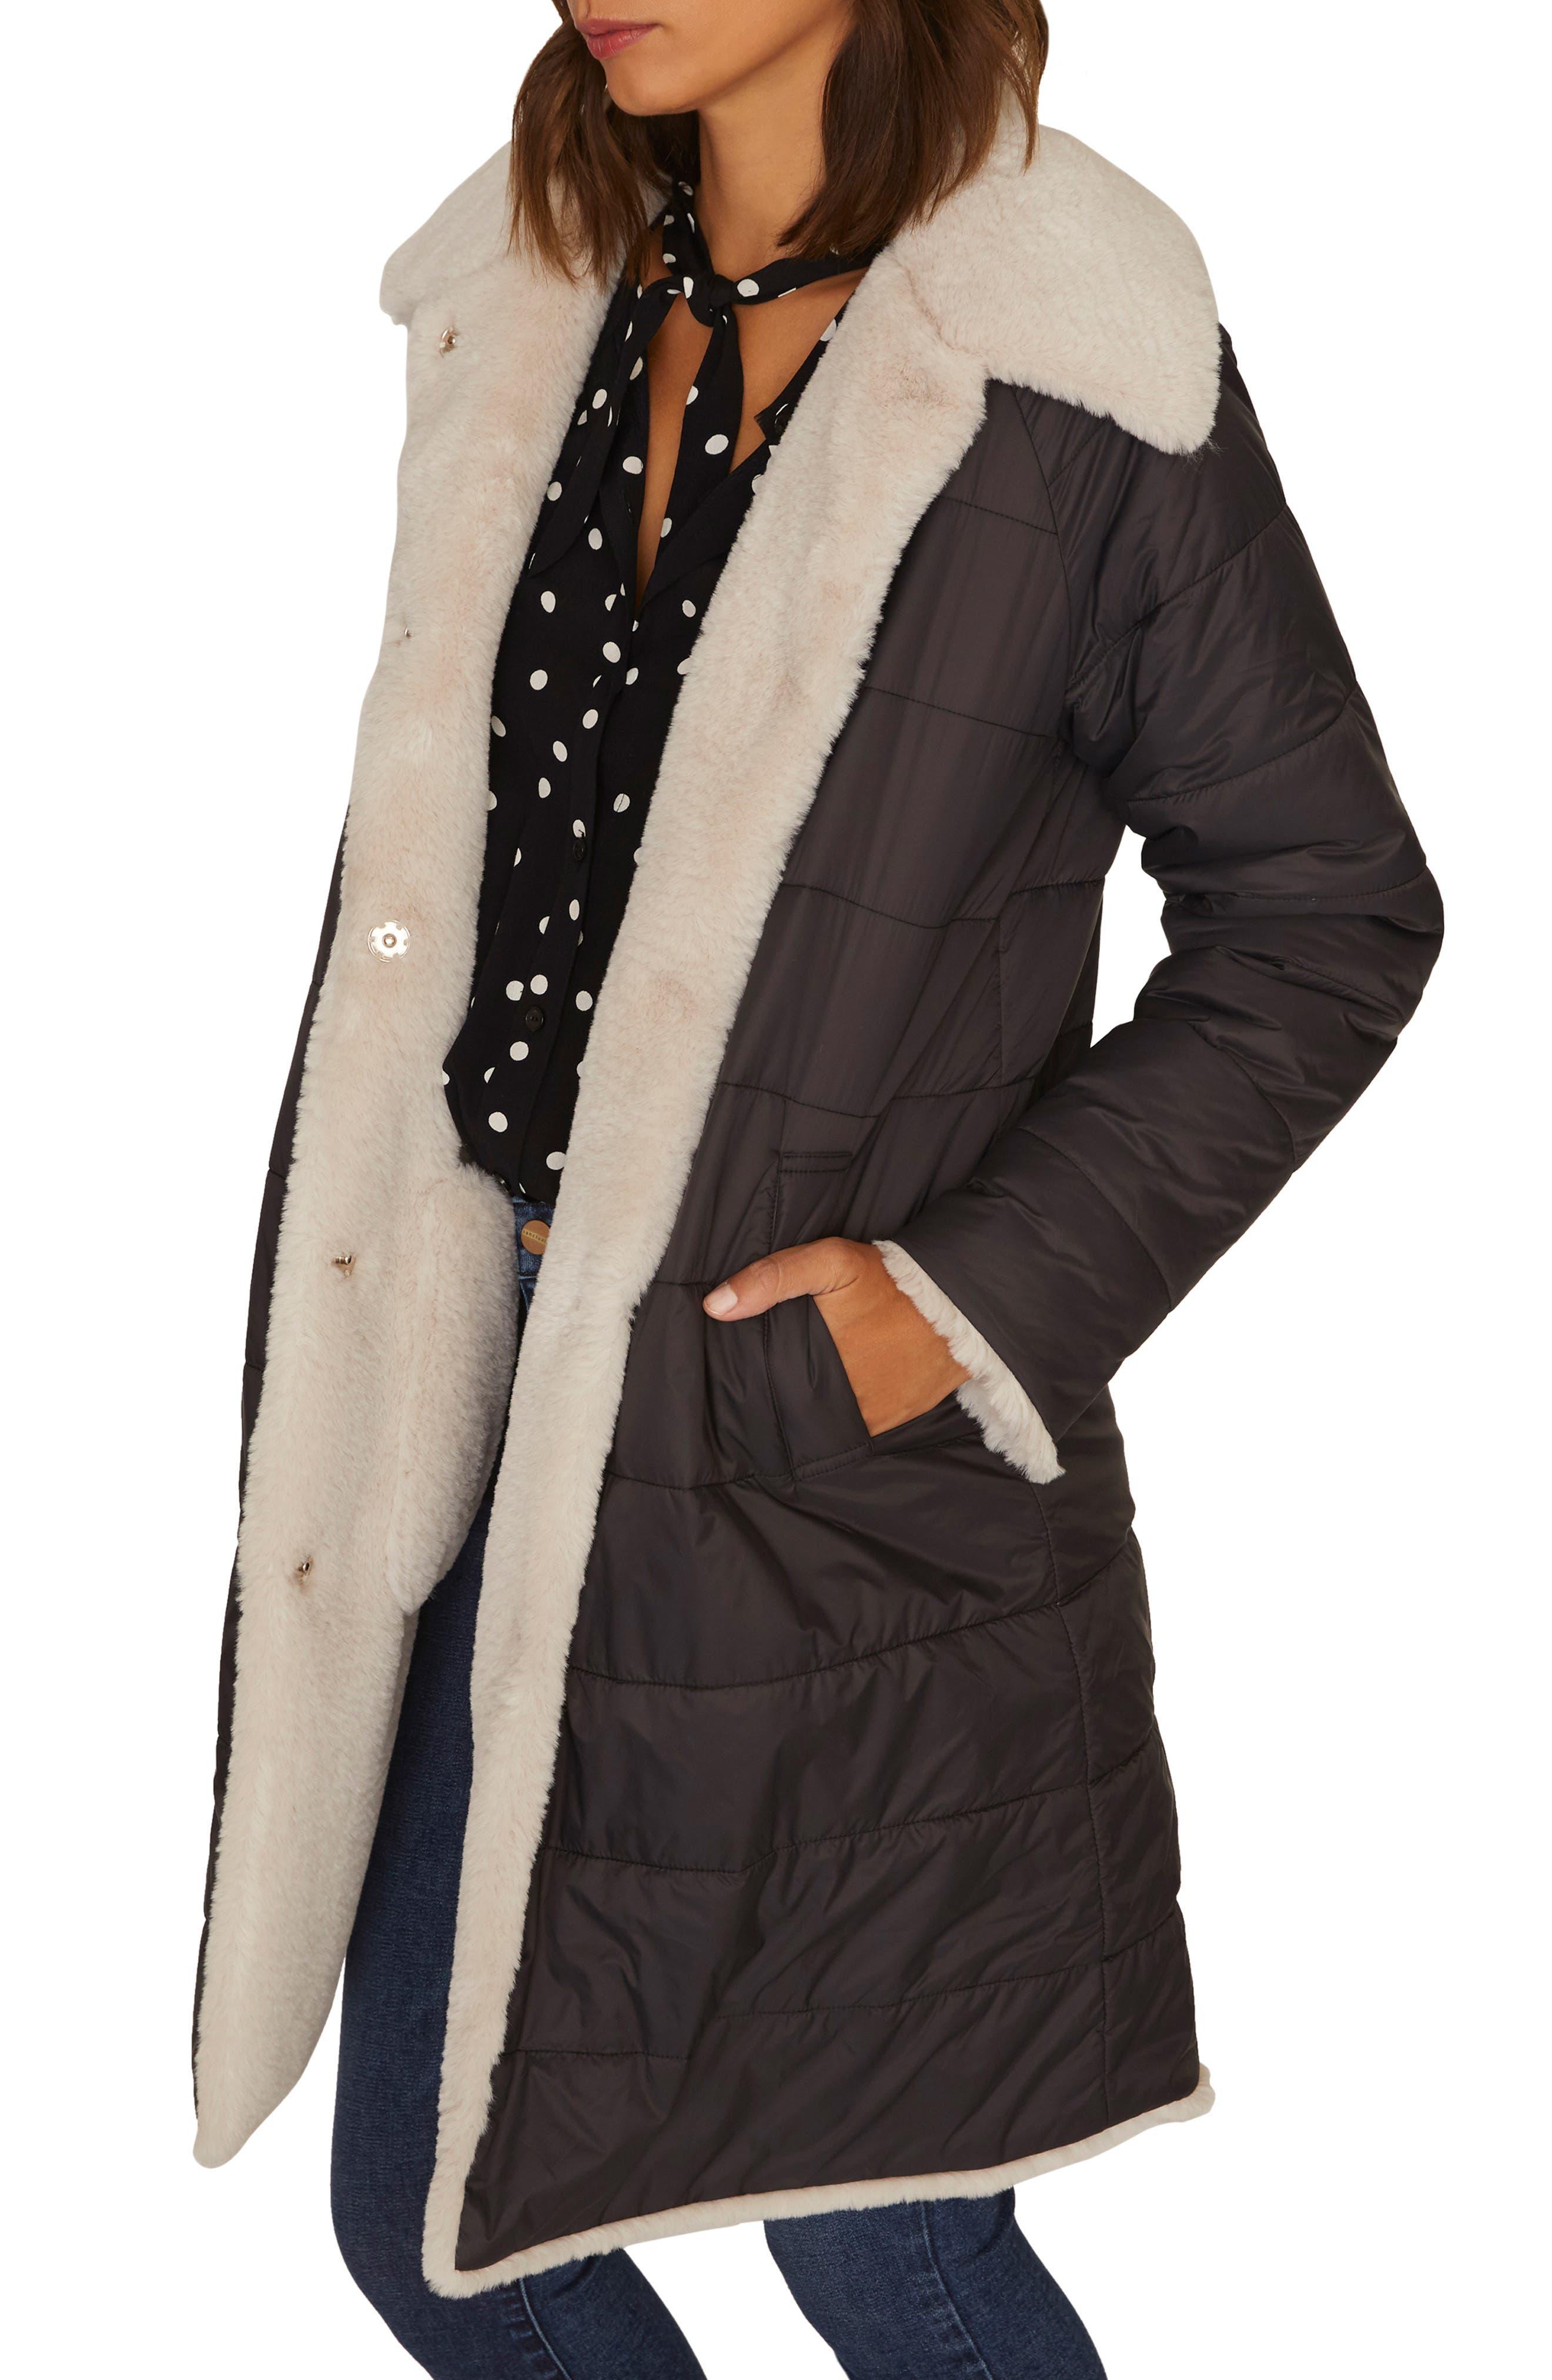 2 Be Real Reversible Puffa Faux Shearling Coat,                             Alternate thumbnail 3, color,                             001